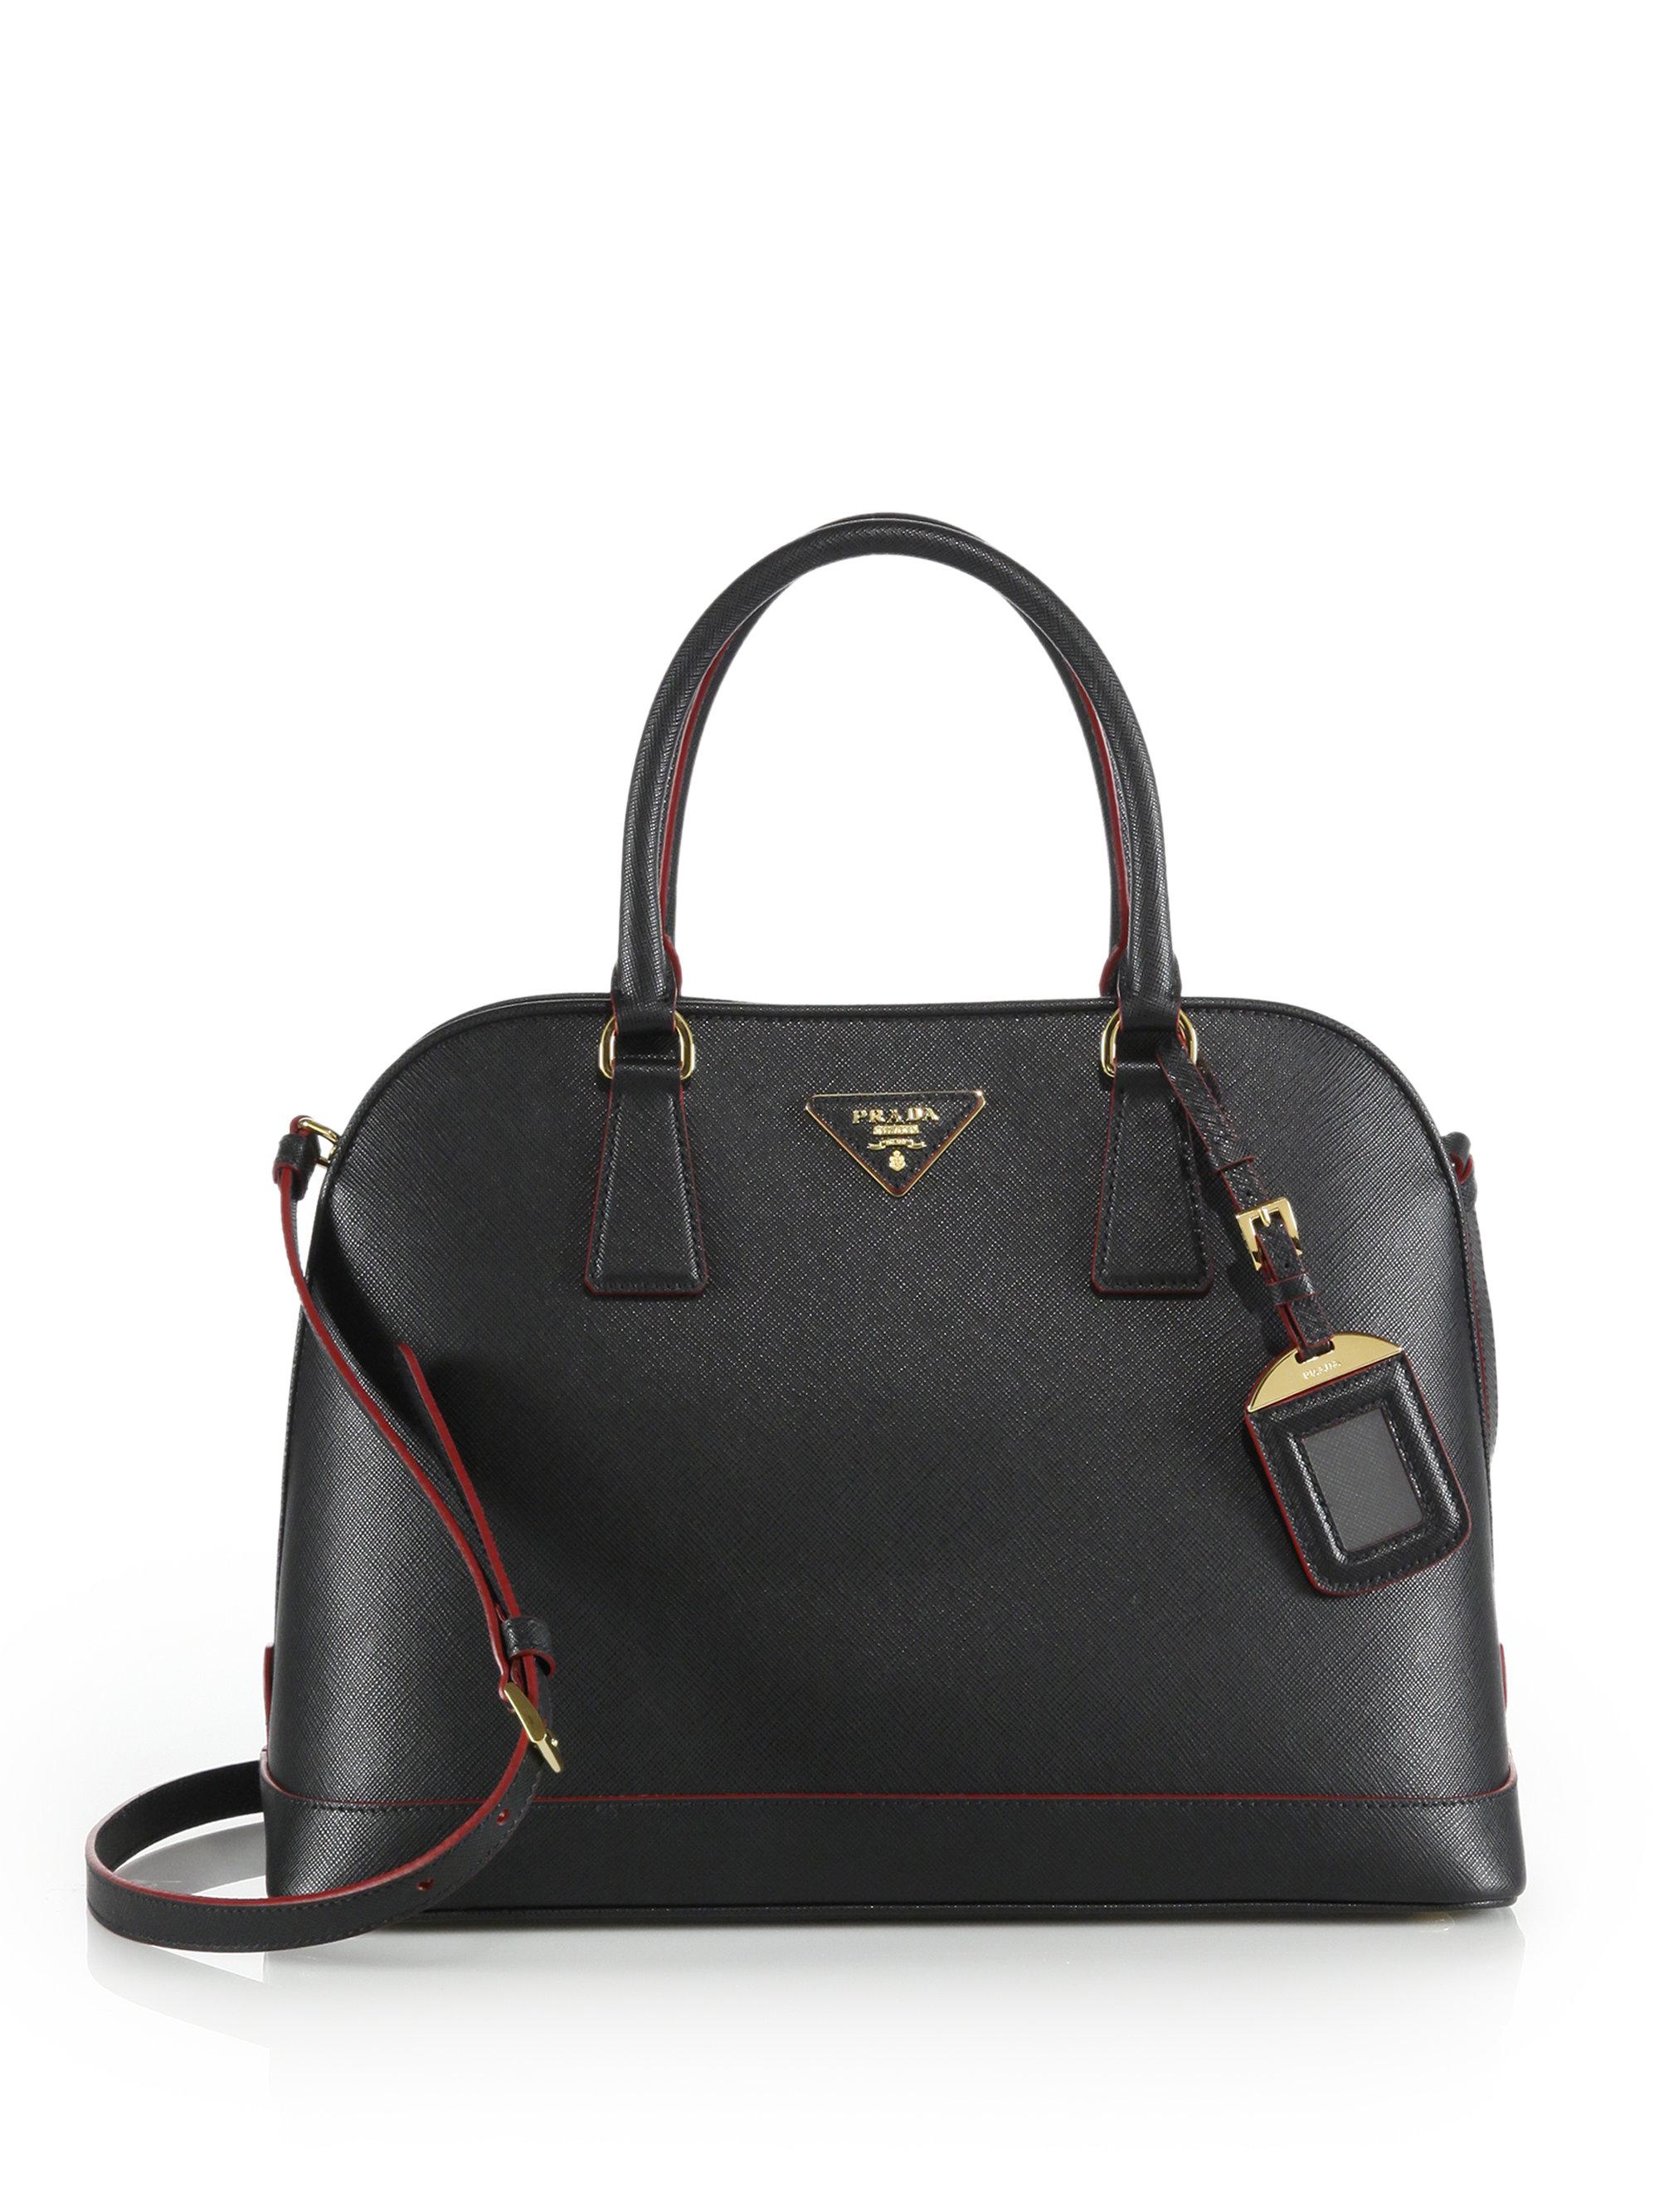 d0afac81b624 Lyst - Prada Saffiano Lux Promenade Leather Satchel in Black